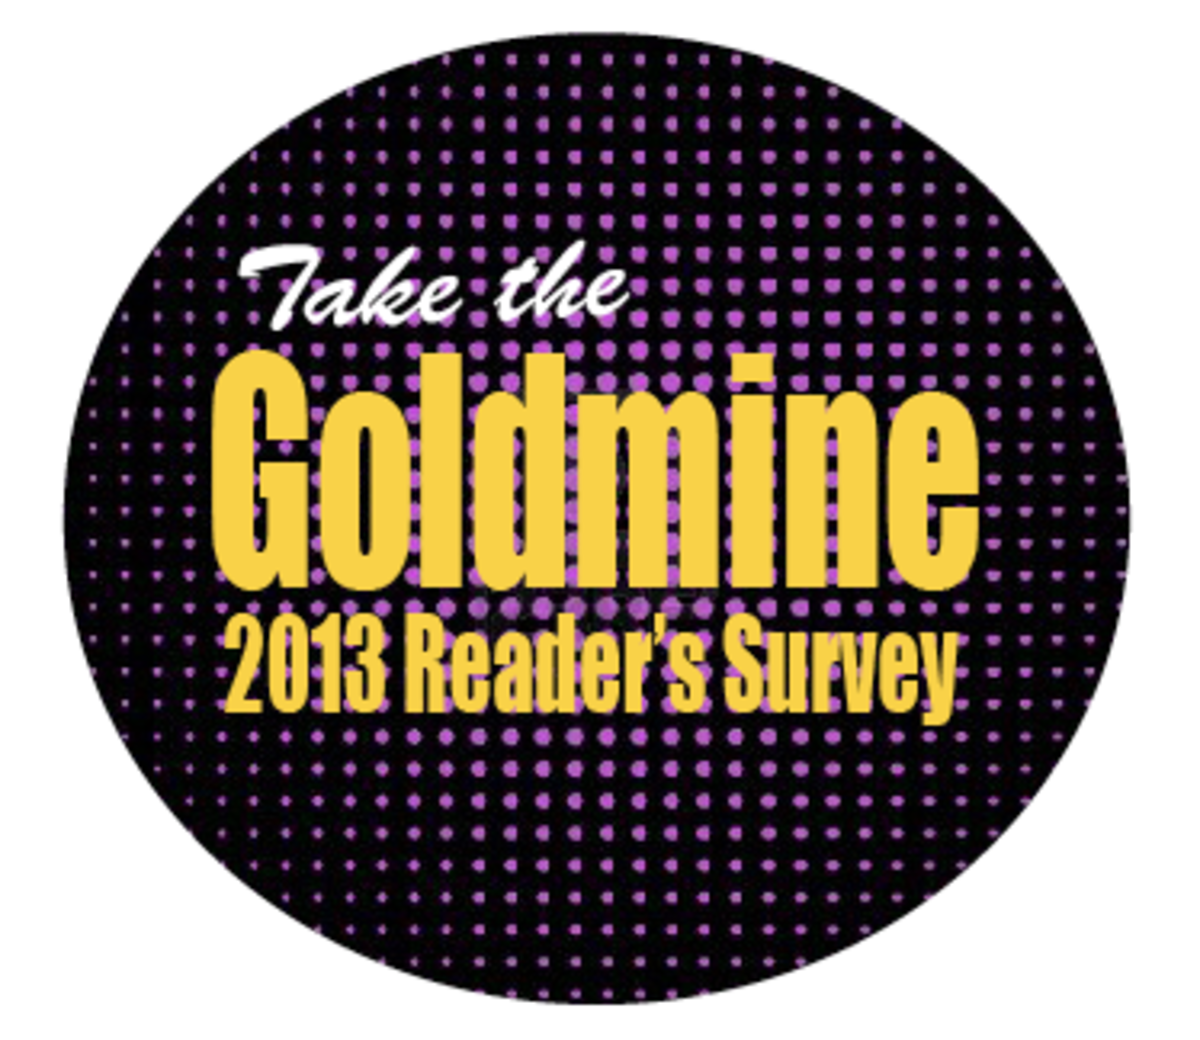 Take the Goldmine Reader's Survey